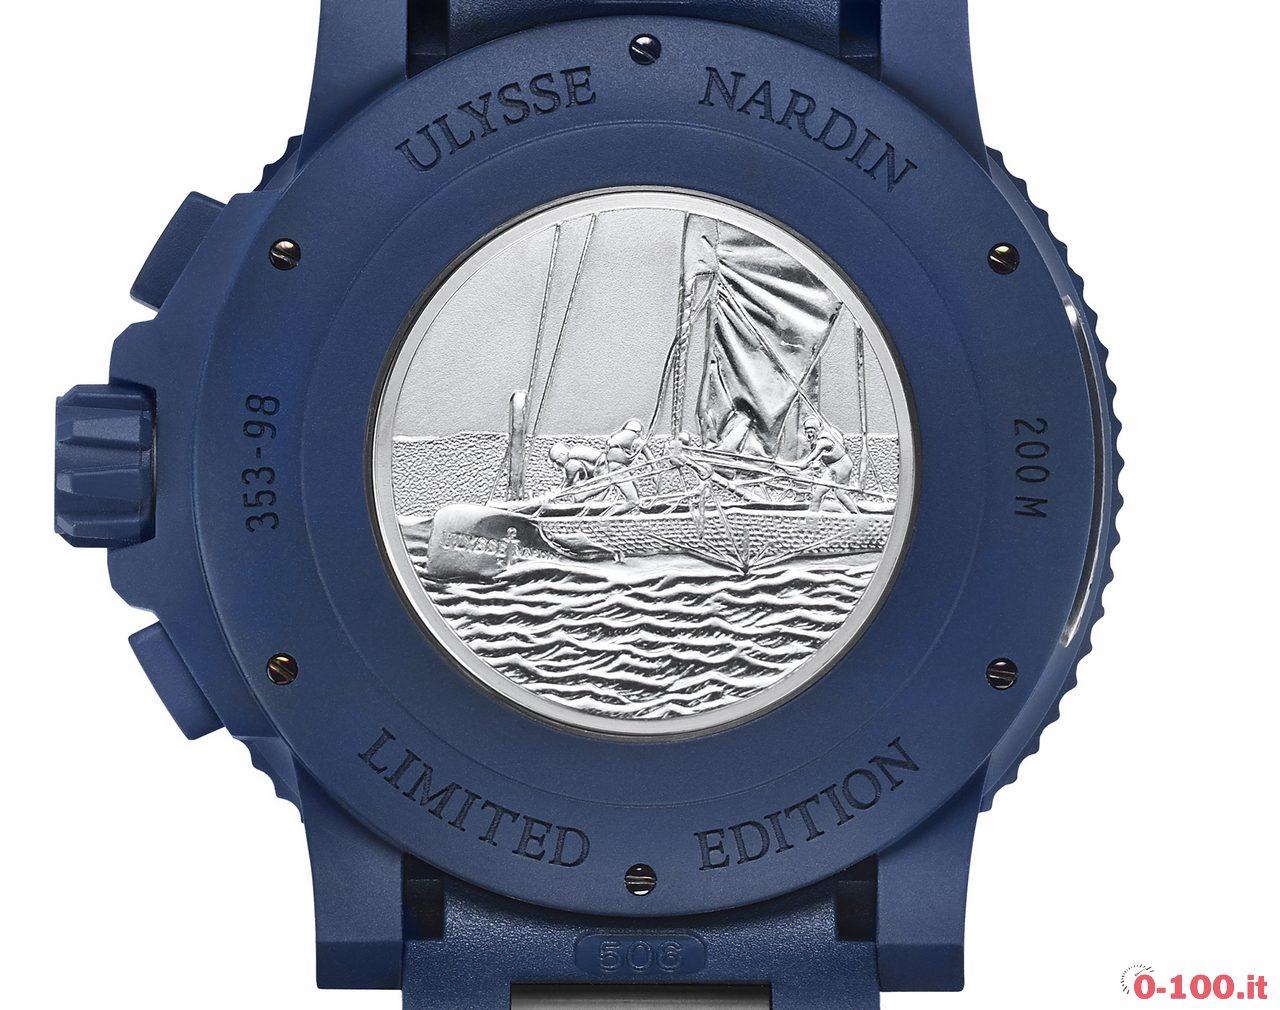 anteprima-sihh-2017-ulysse-nardin-diver-chronograph-artemis-racing-limited-edition-ref-353-98le-3artemis-prezzo-price_0-1005